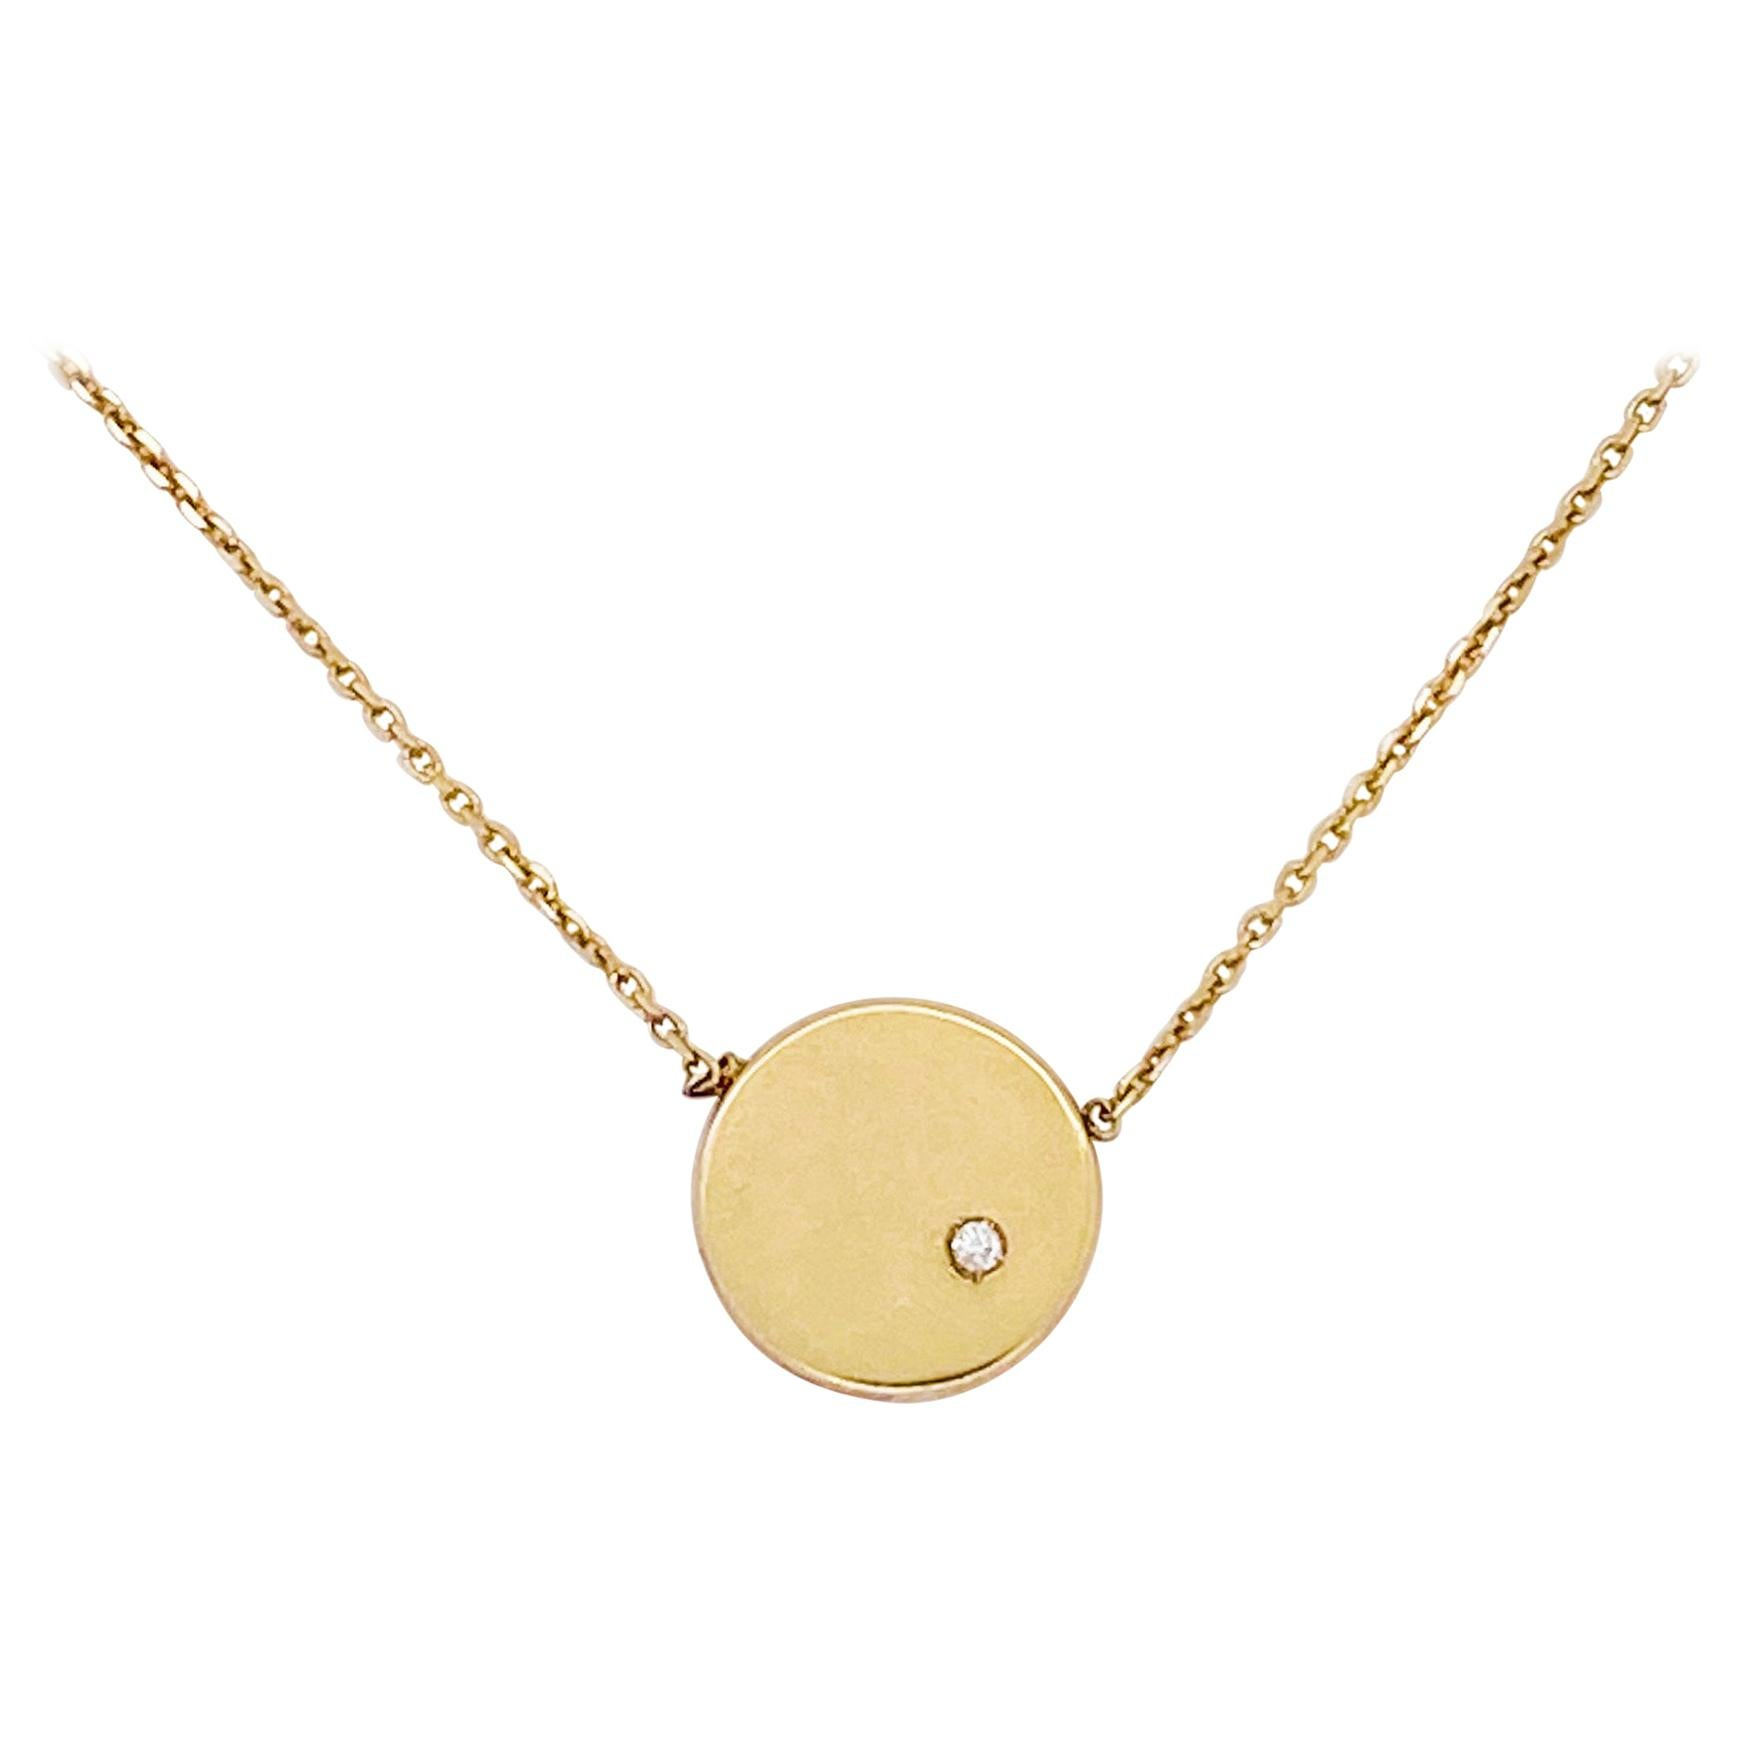 Gold Diamond Disk Necklace 14 Karat Gold Round Diamond Accent Engraving Disk